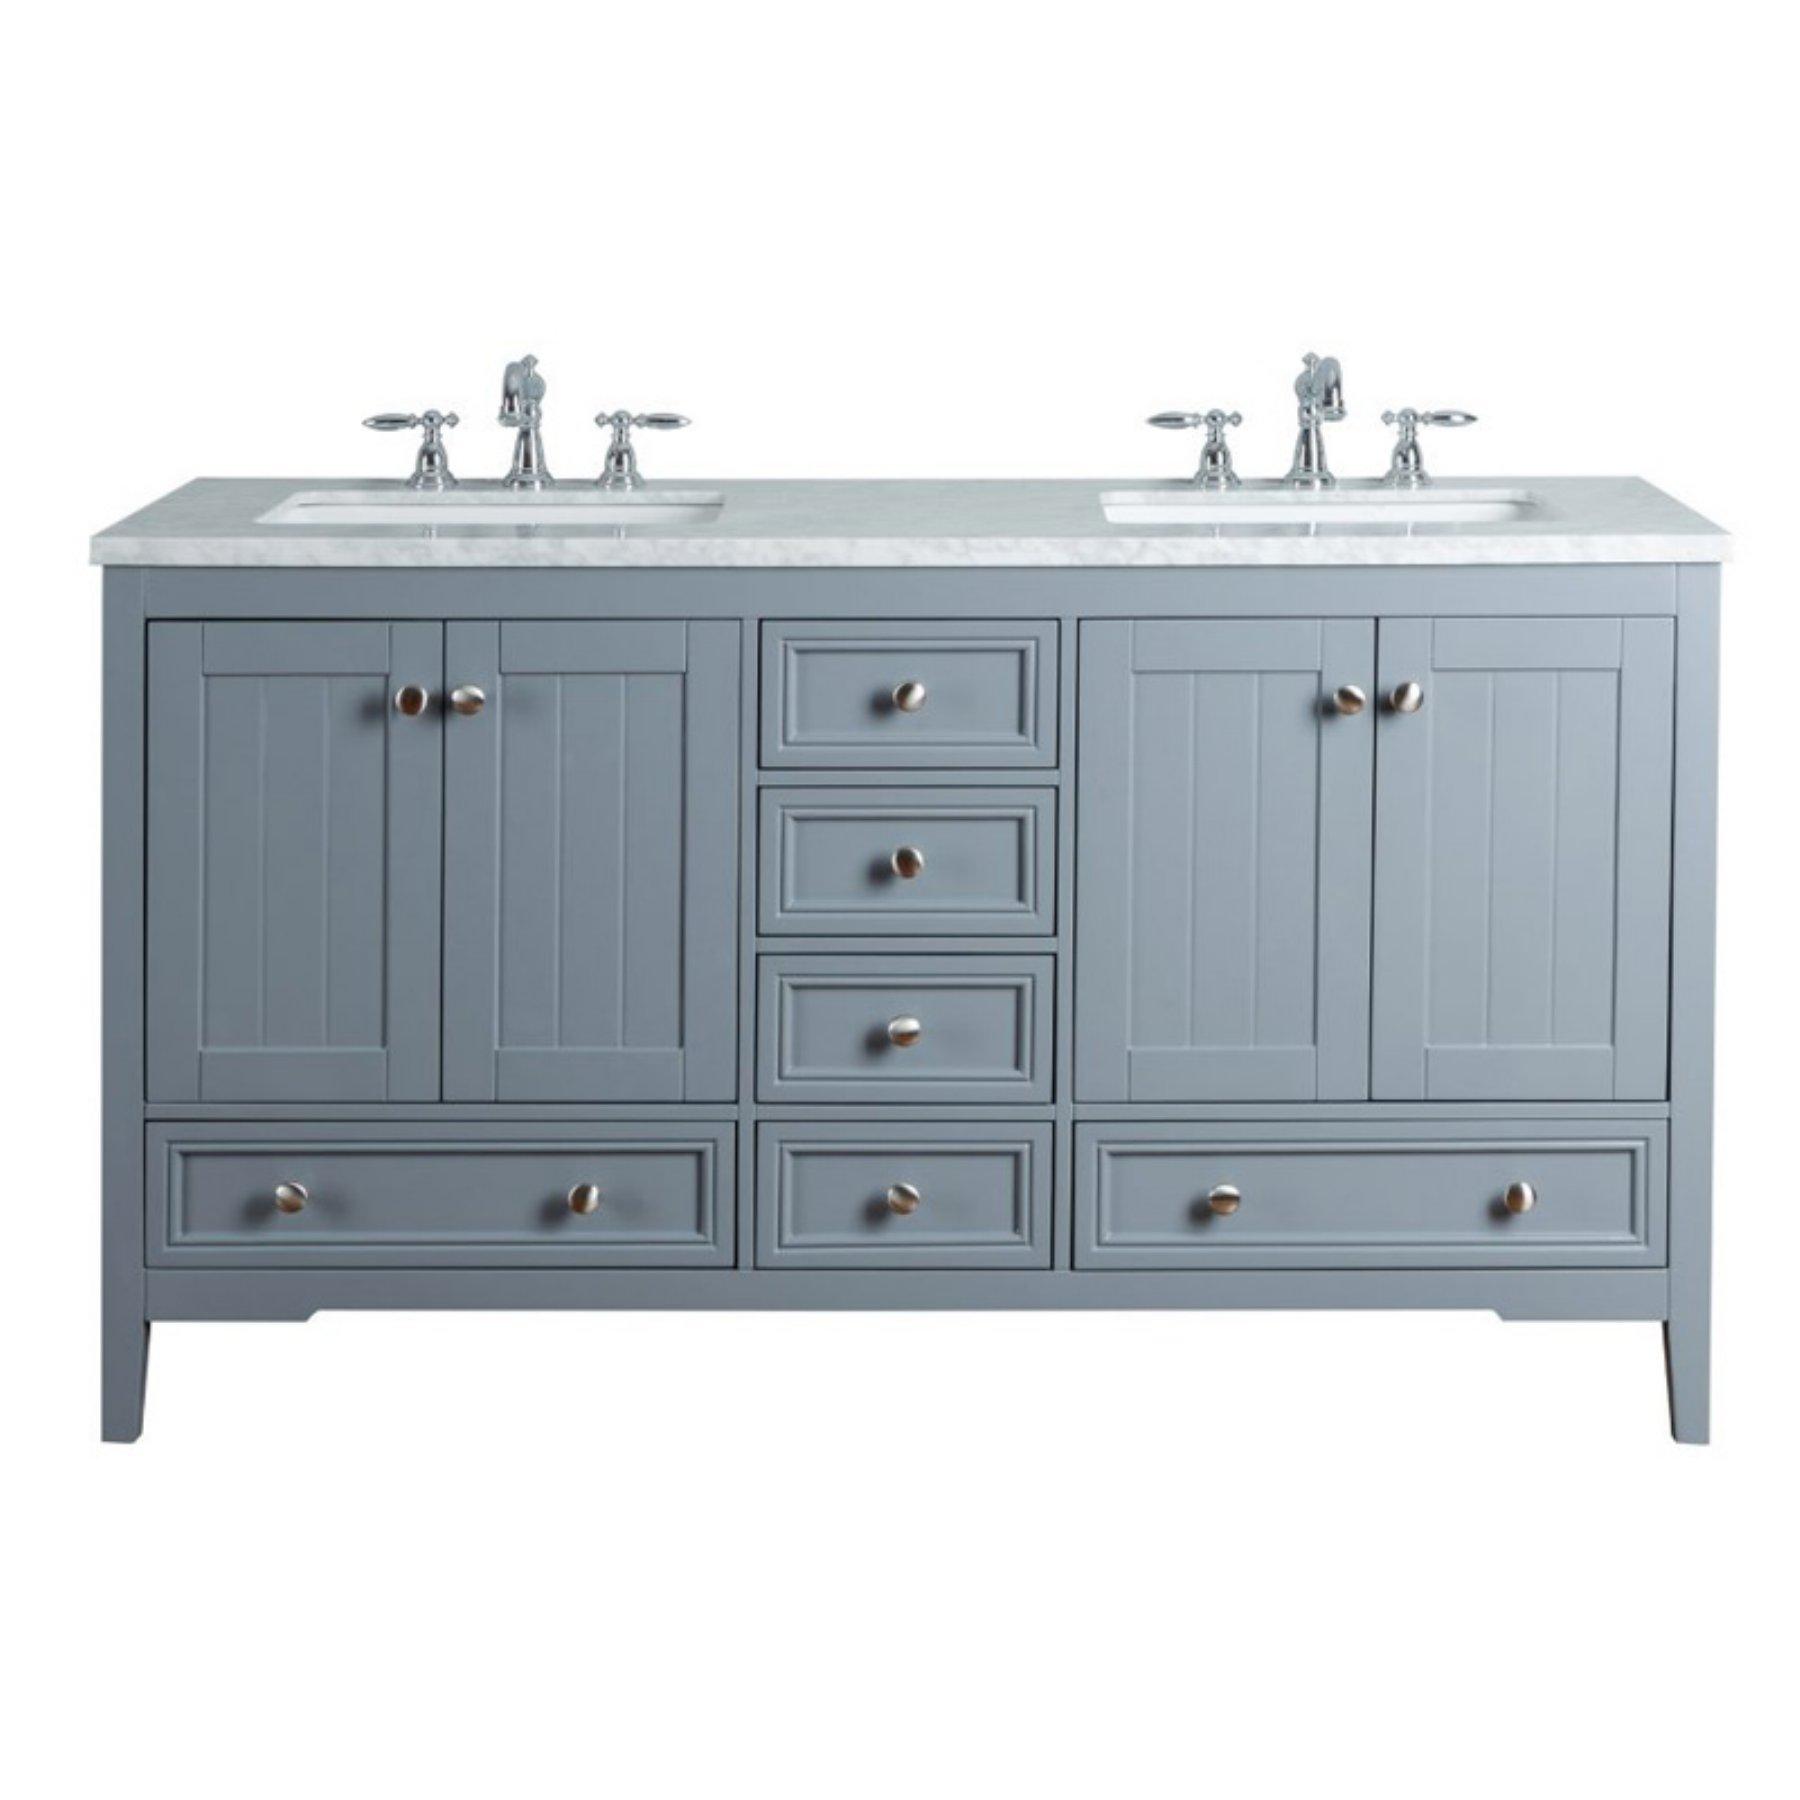 Double Sink Bathroom Vanity  85E21Cd22A2840218203Deff1A9687Ab